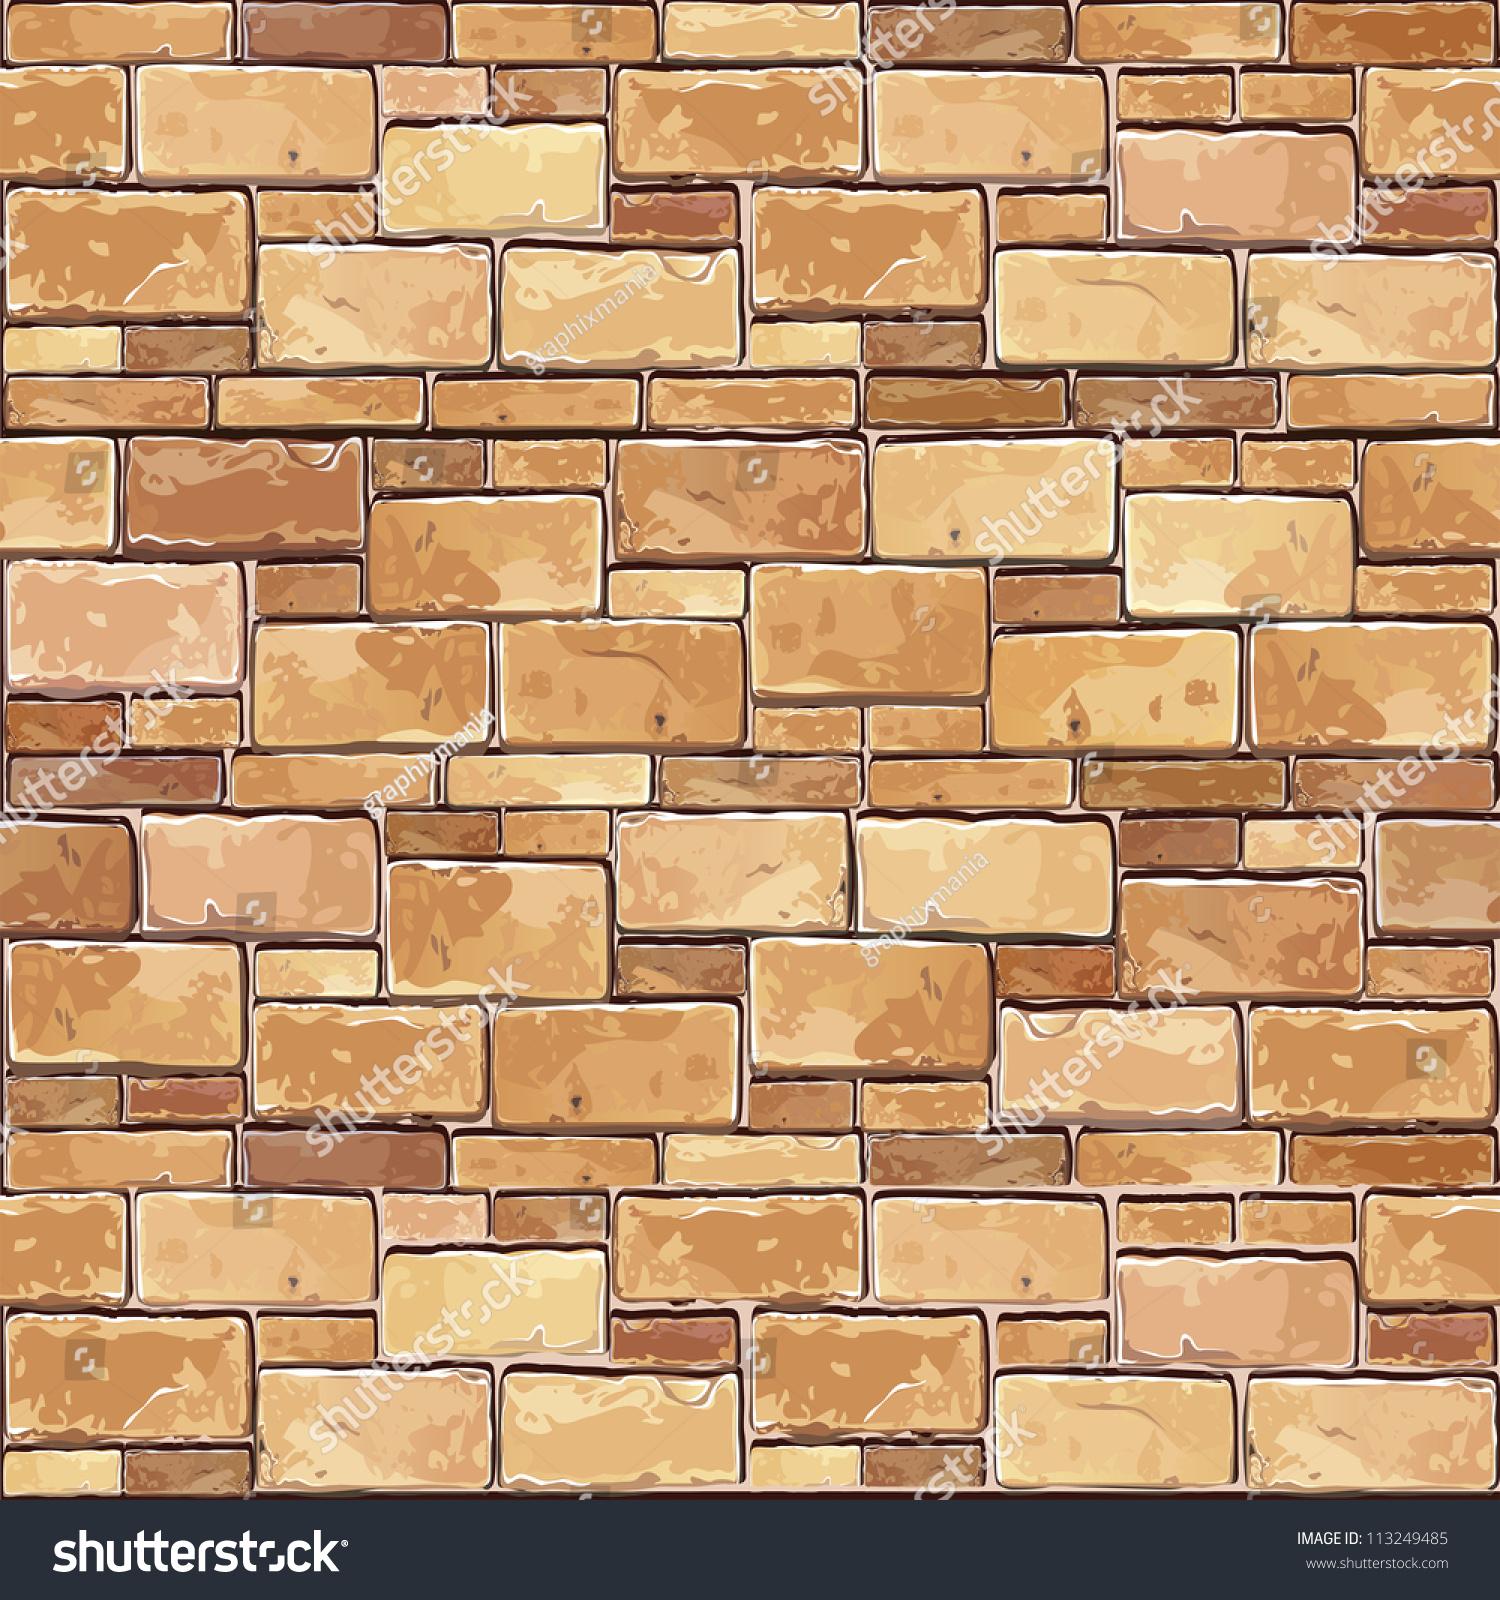 Stone Brick Wall Seamless Vector Illustration Stock Vector